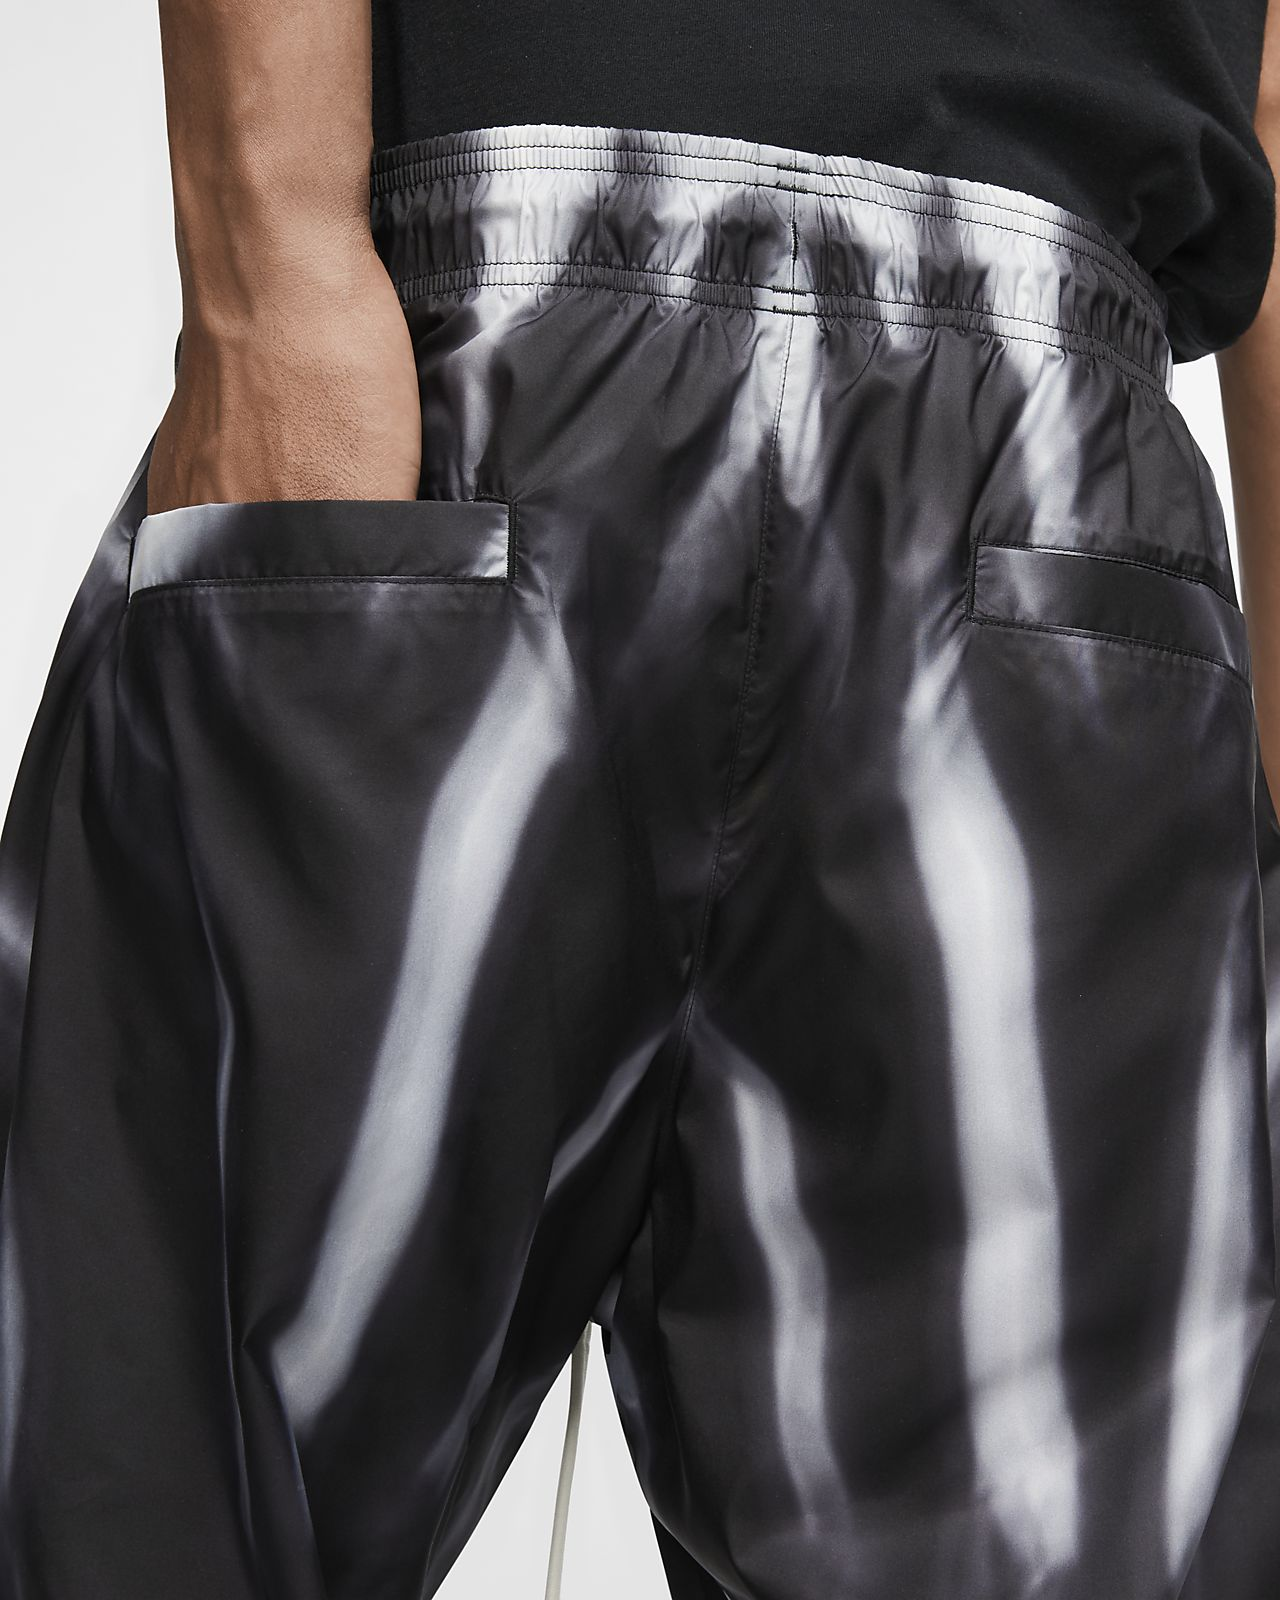 758c6c2f Nike x Fear of God Allover Print Pants. Nike.com